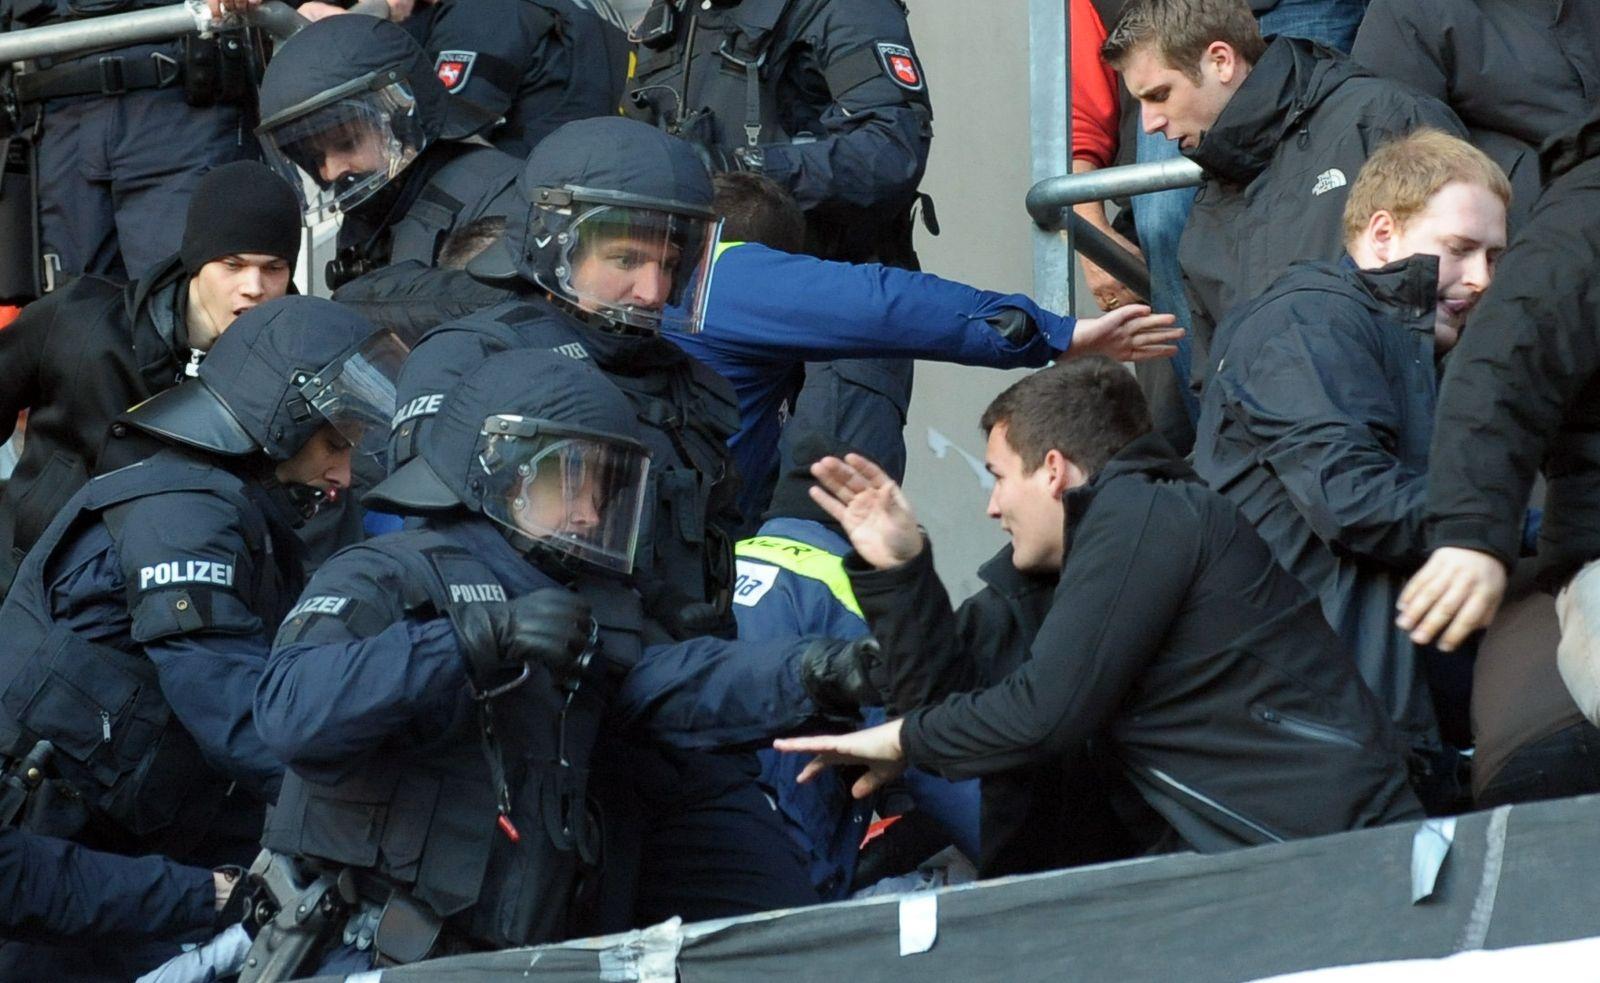 Gewalt in Stadien in Niedersachsen